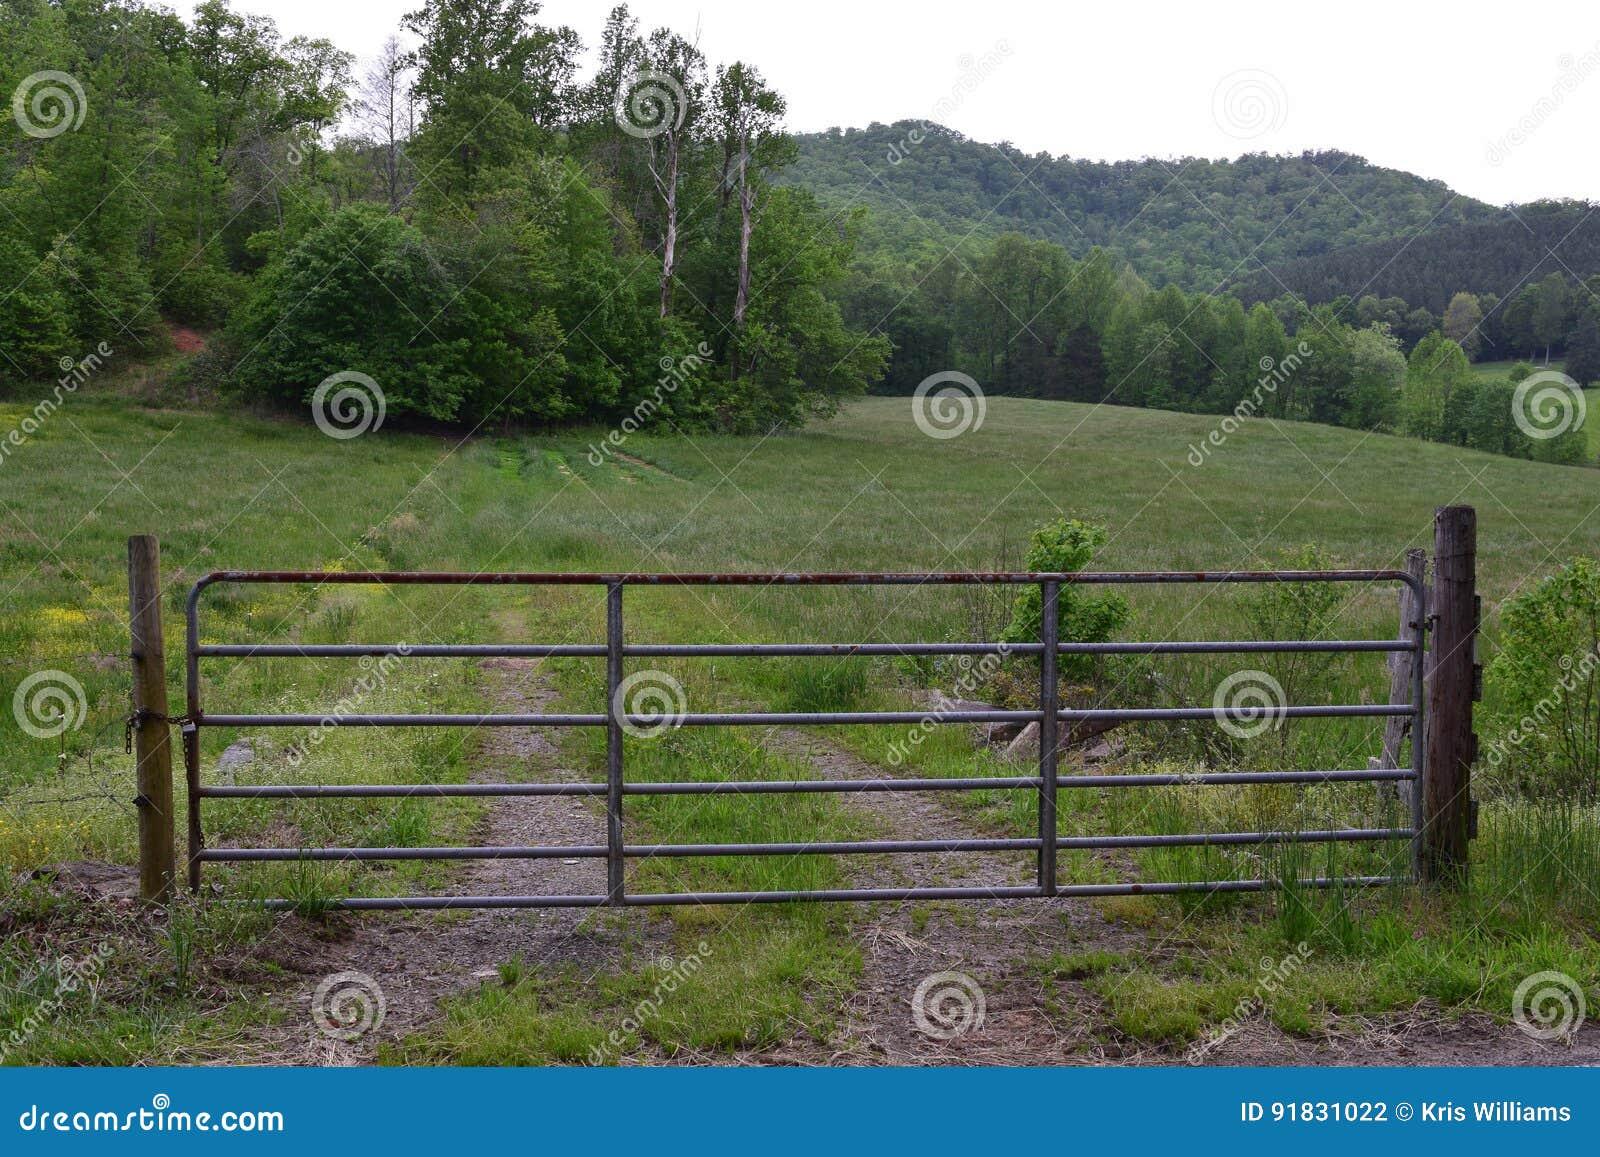 Western NC rural country gated farm field